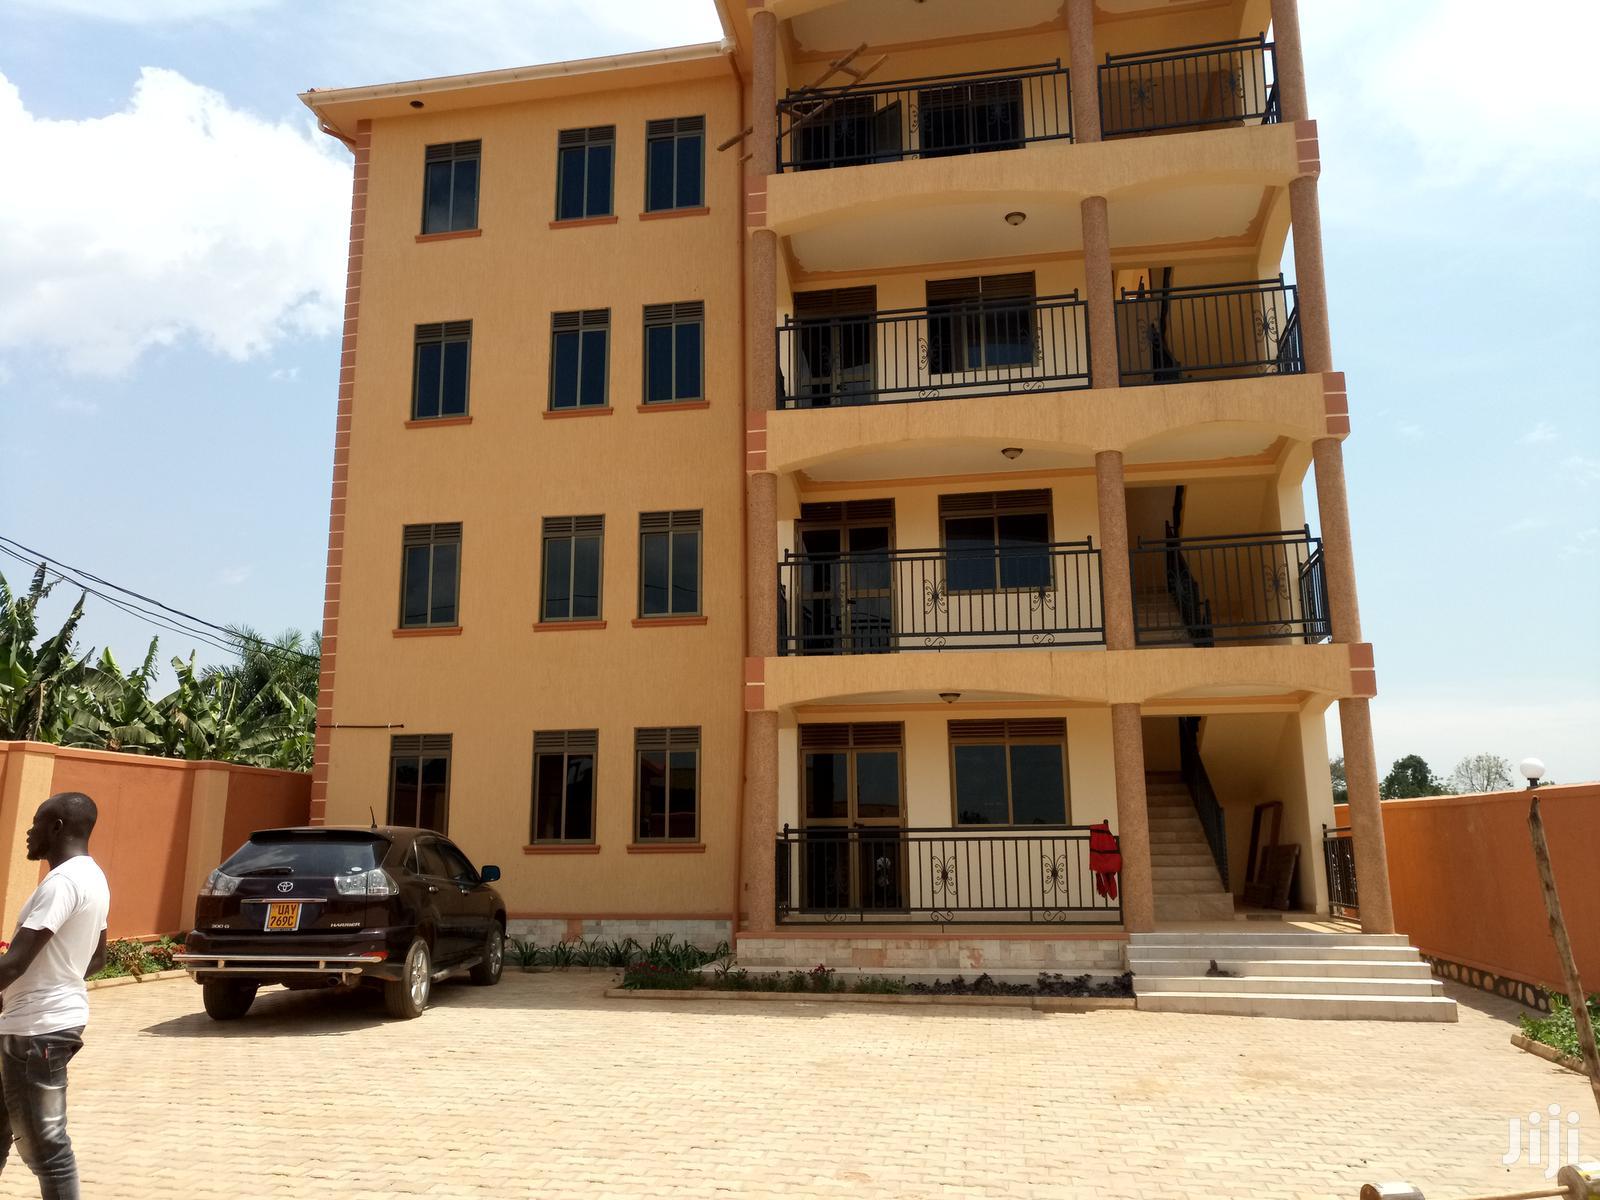 NAMUGONGO Three Bedroom Apartment House For Rent